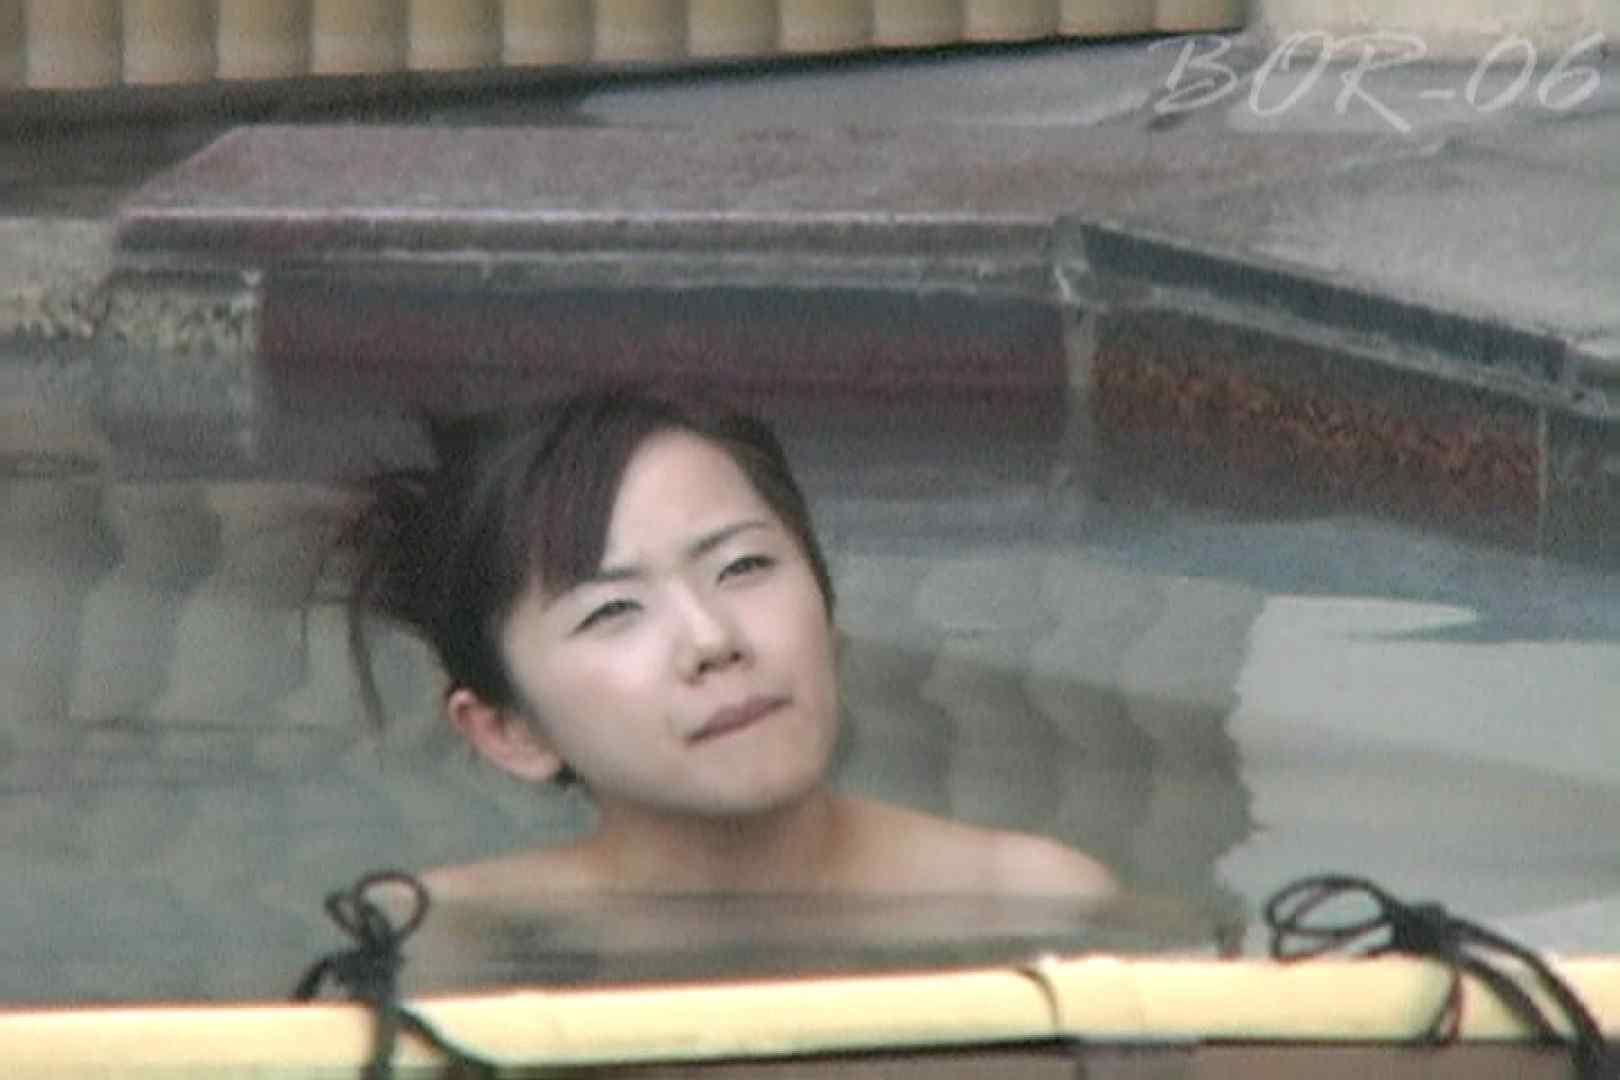 Aquaな露天風呂Vol.521 盗撮  45連発 30